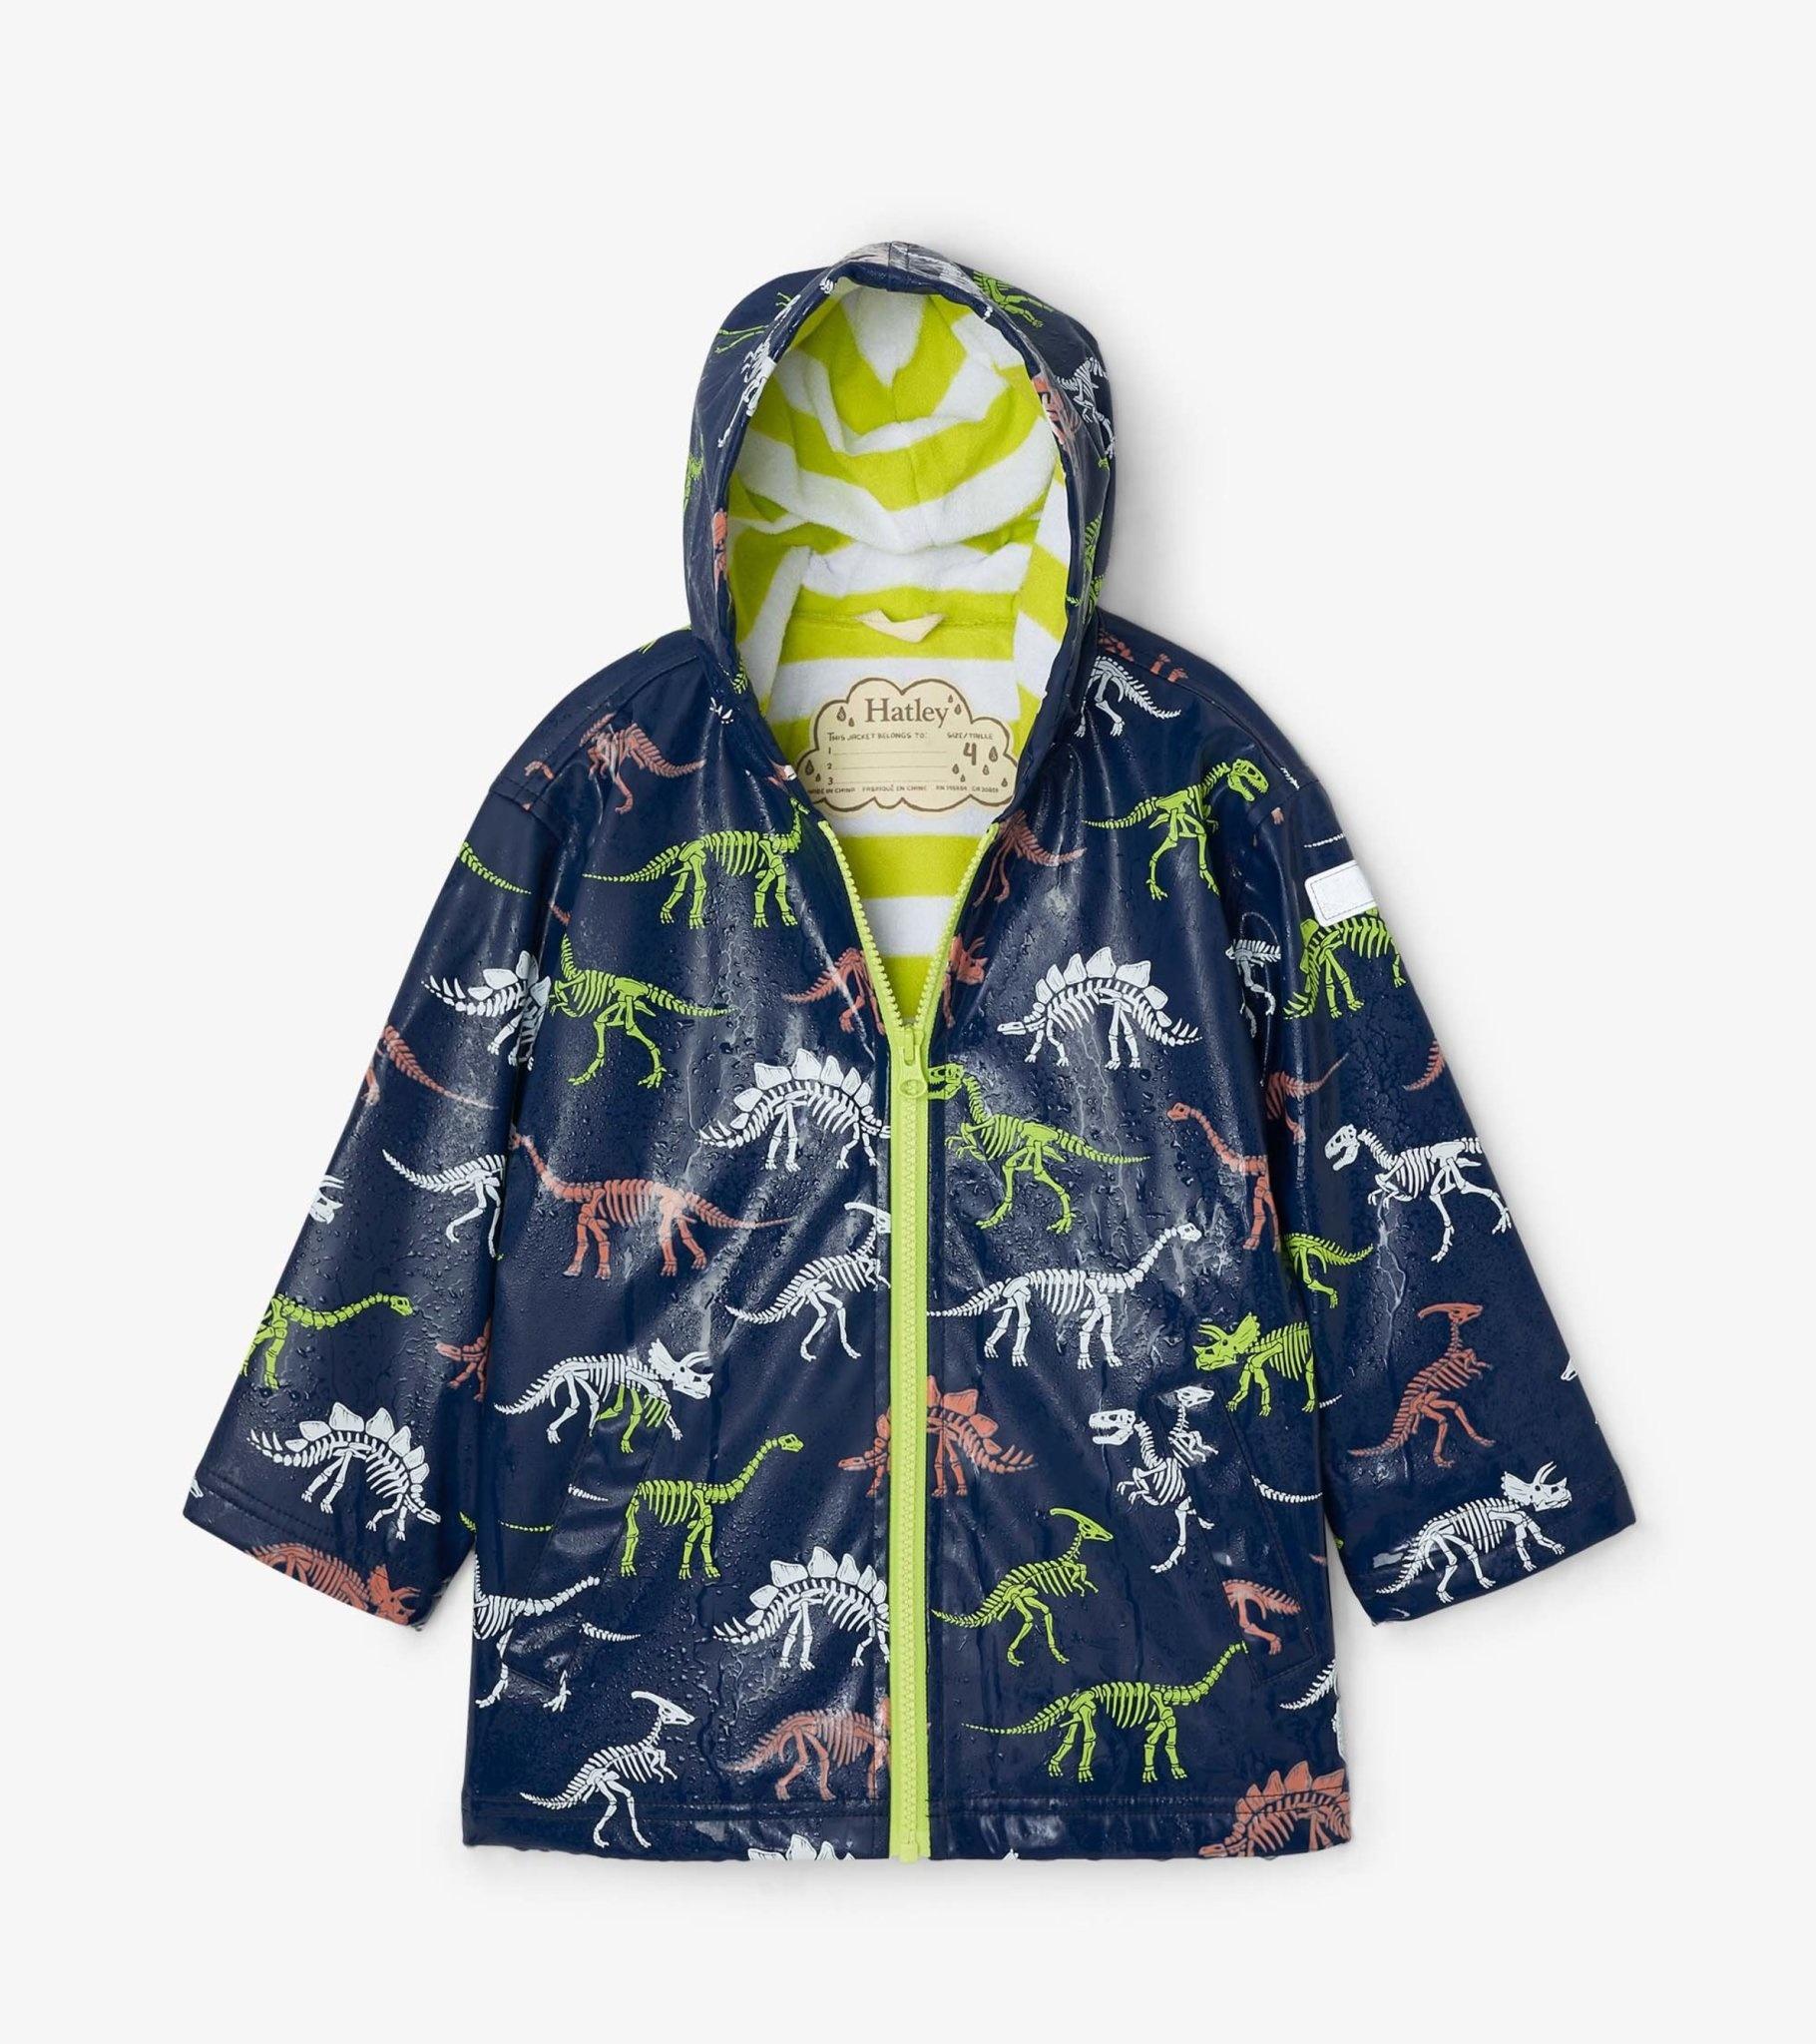 Hatley Hatley Dino Color Changing Splash Jacket